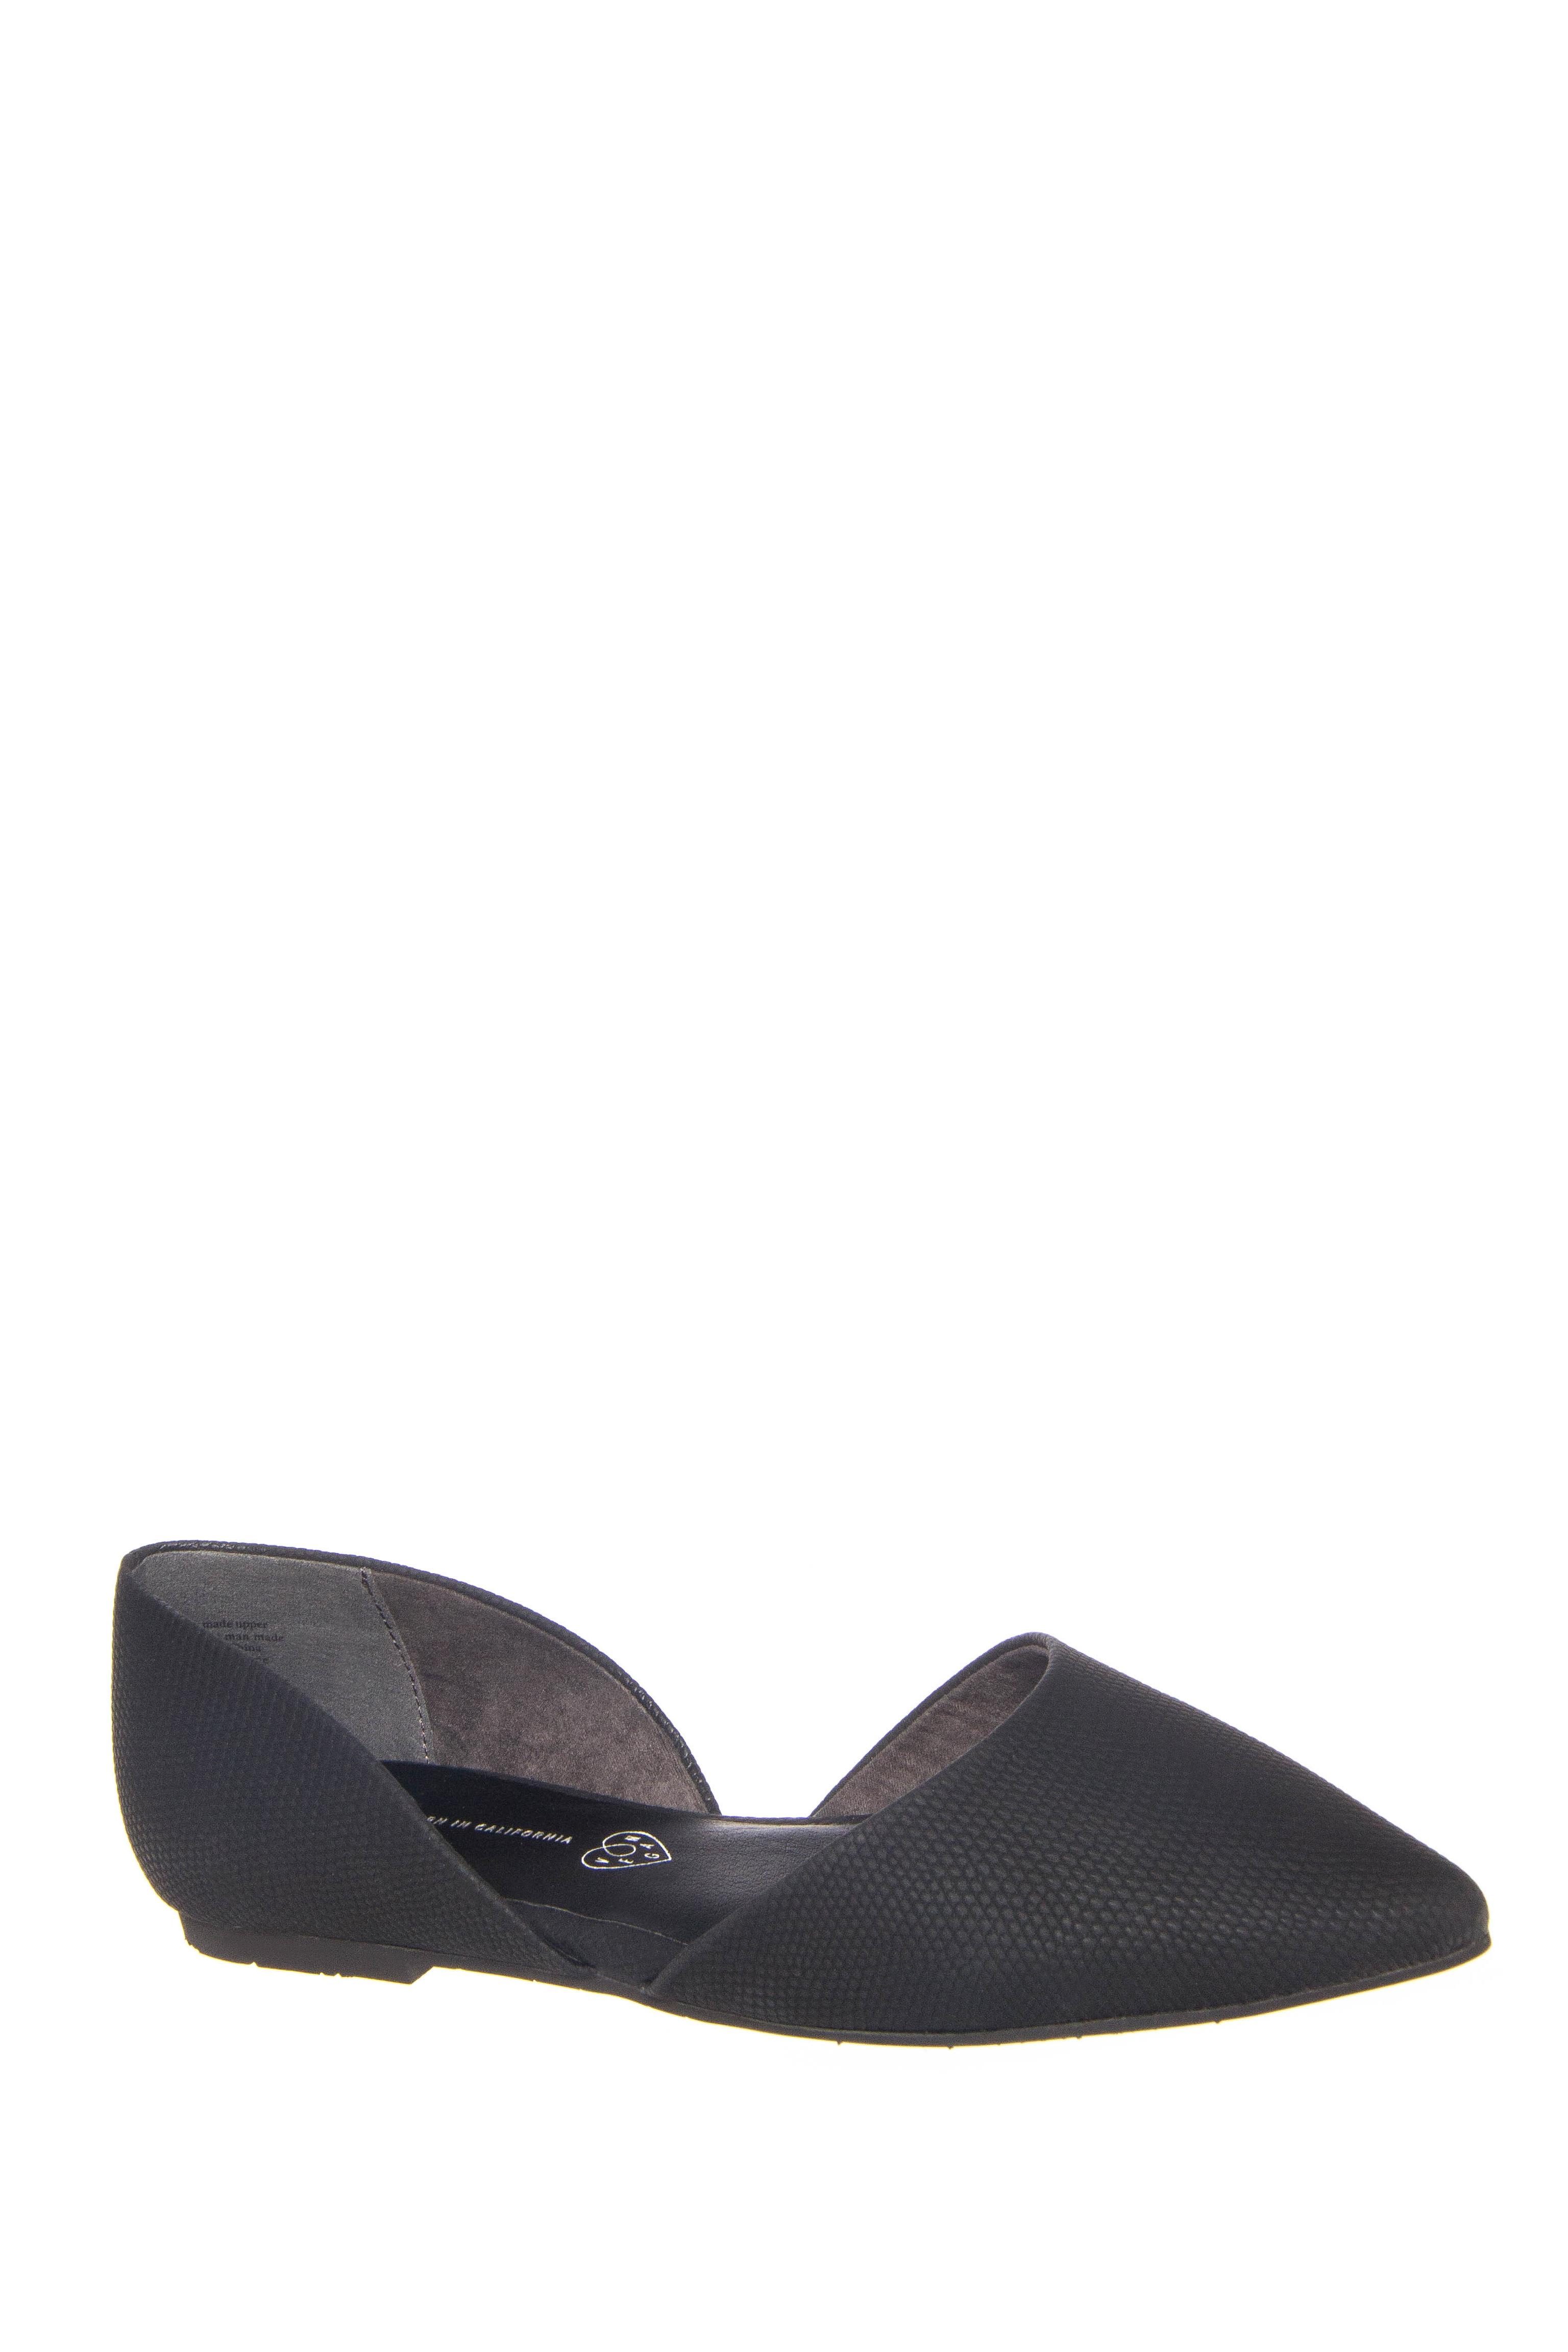 BC Footwear Society d'Orsay Flats - Black Lizard